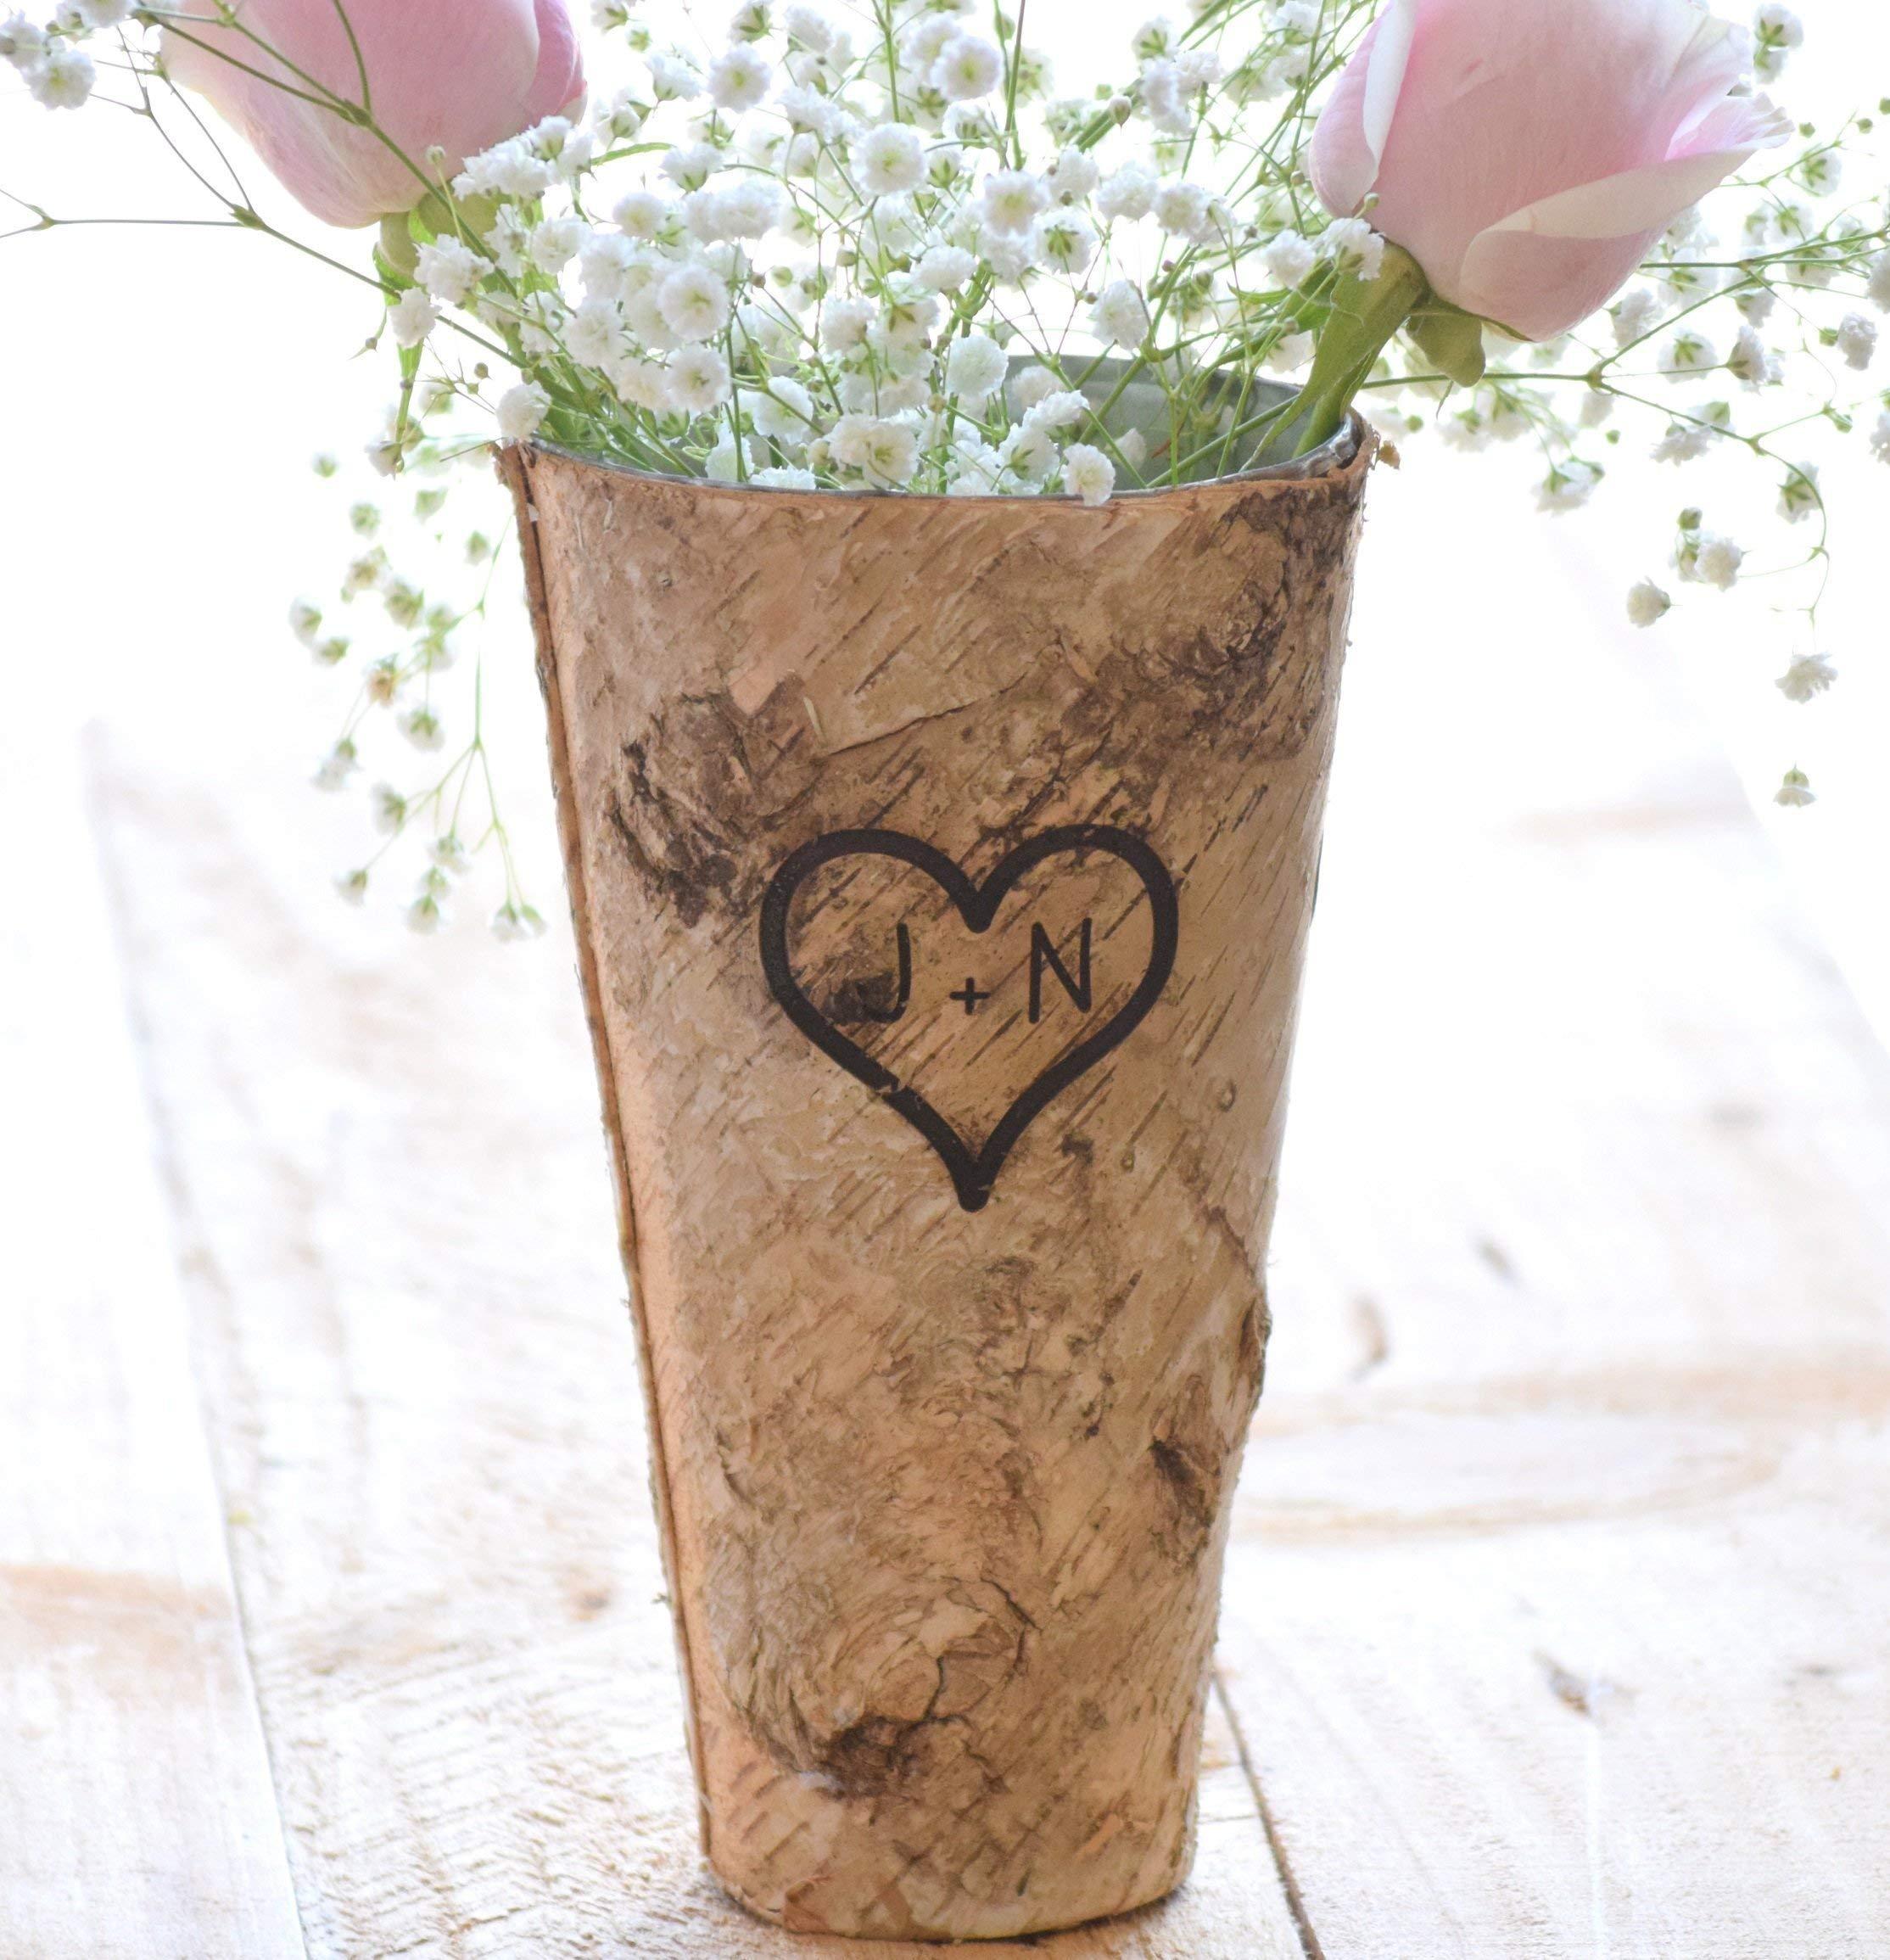 Personalized Birch Vase - Engraved Birch Vase - Wood Planter - Personalized Wedding Gift - 9'' Vase - Birch Bark Vase - Anniversary Gift